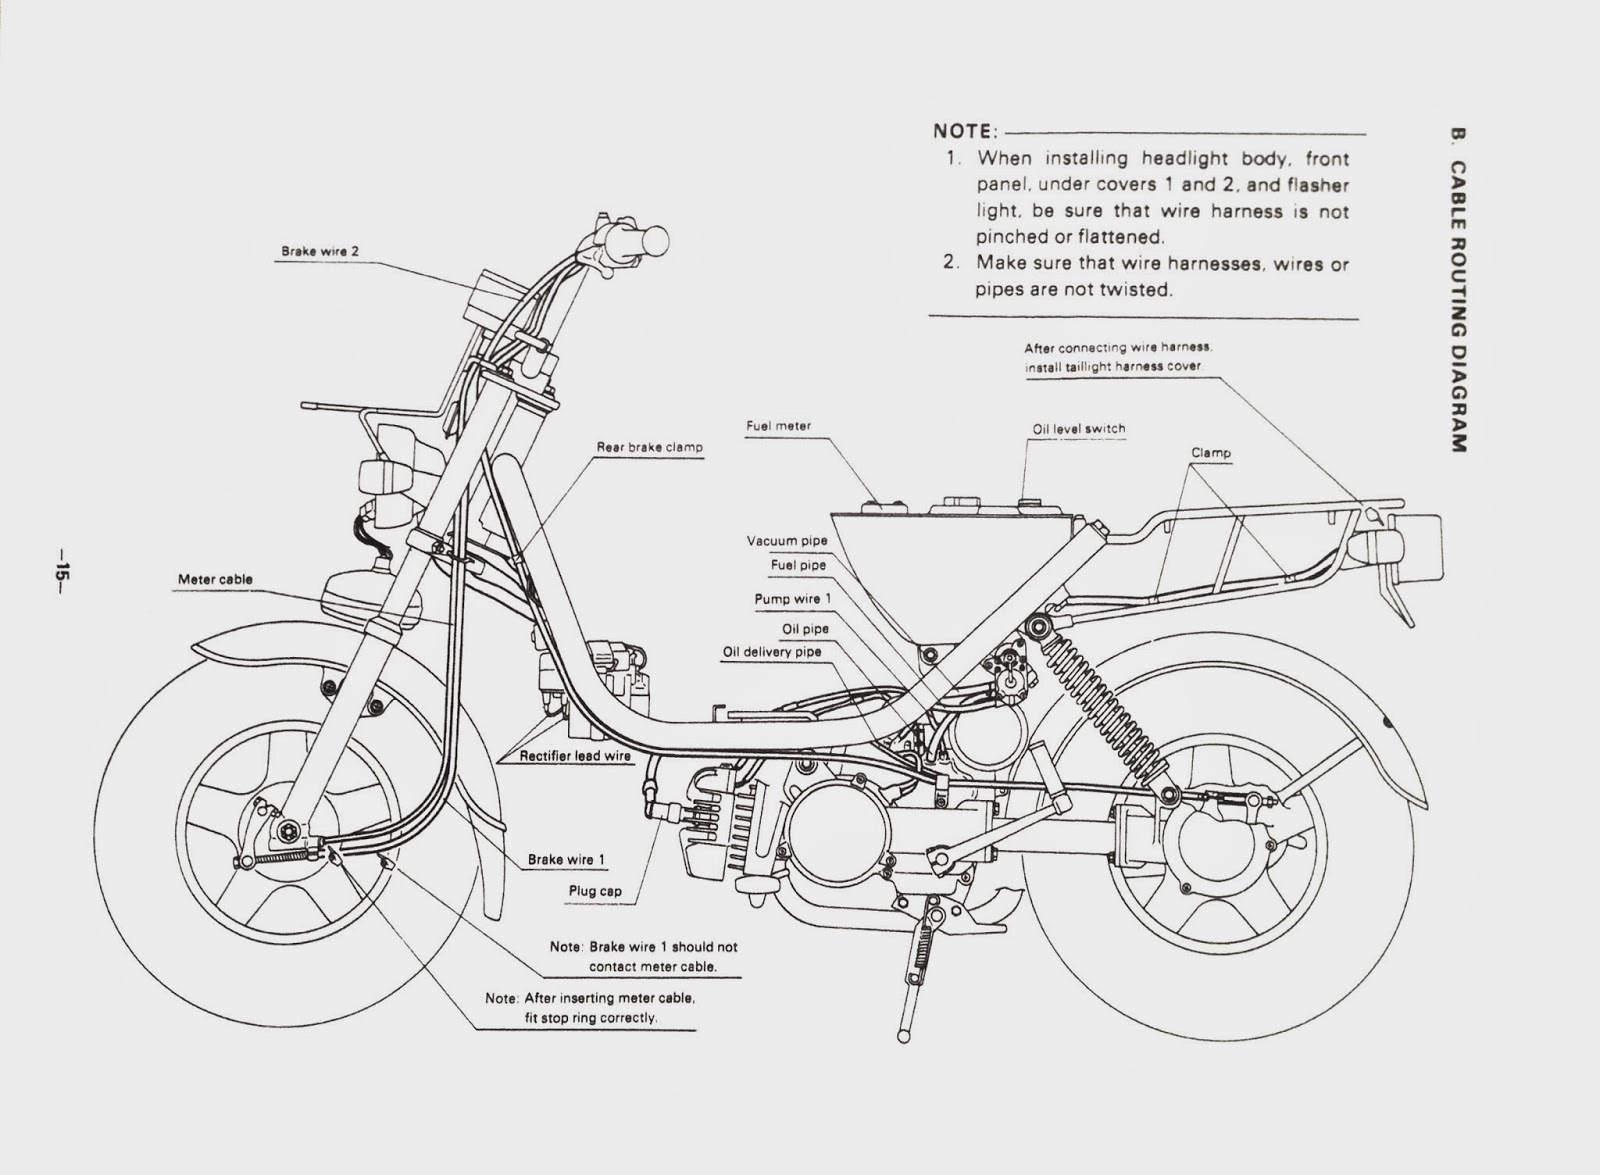 yamaha lc50 yamaha lc50 service manual yamaha parts diagram lc 50 service manual in jpg format